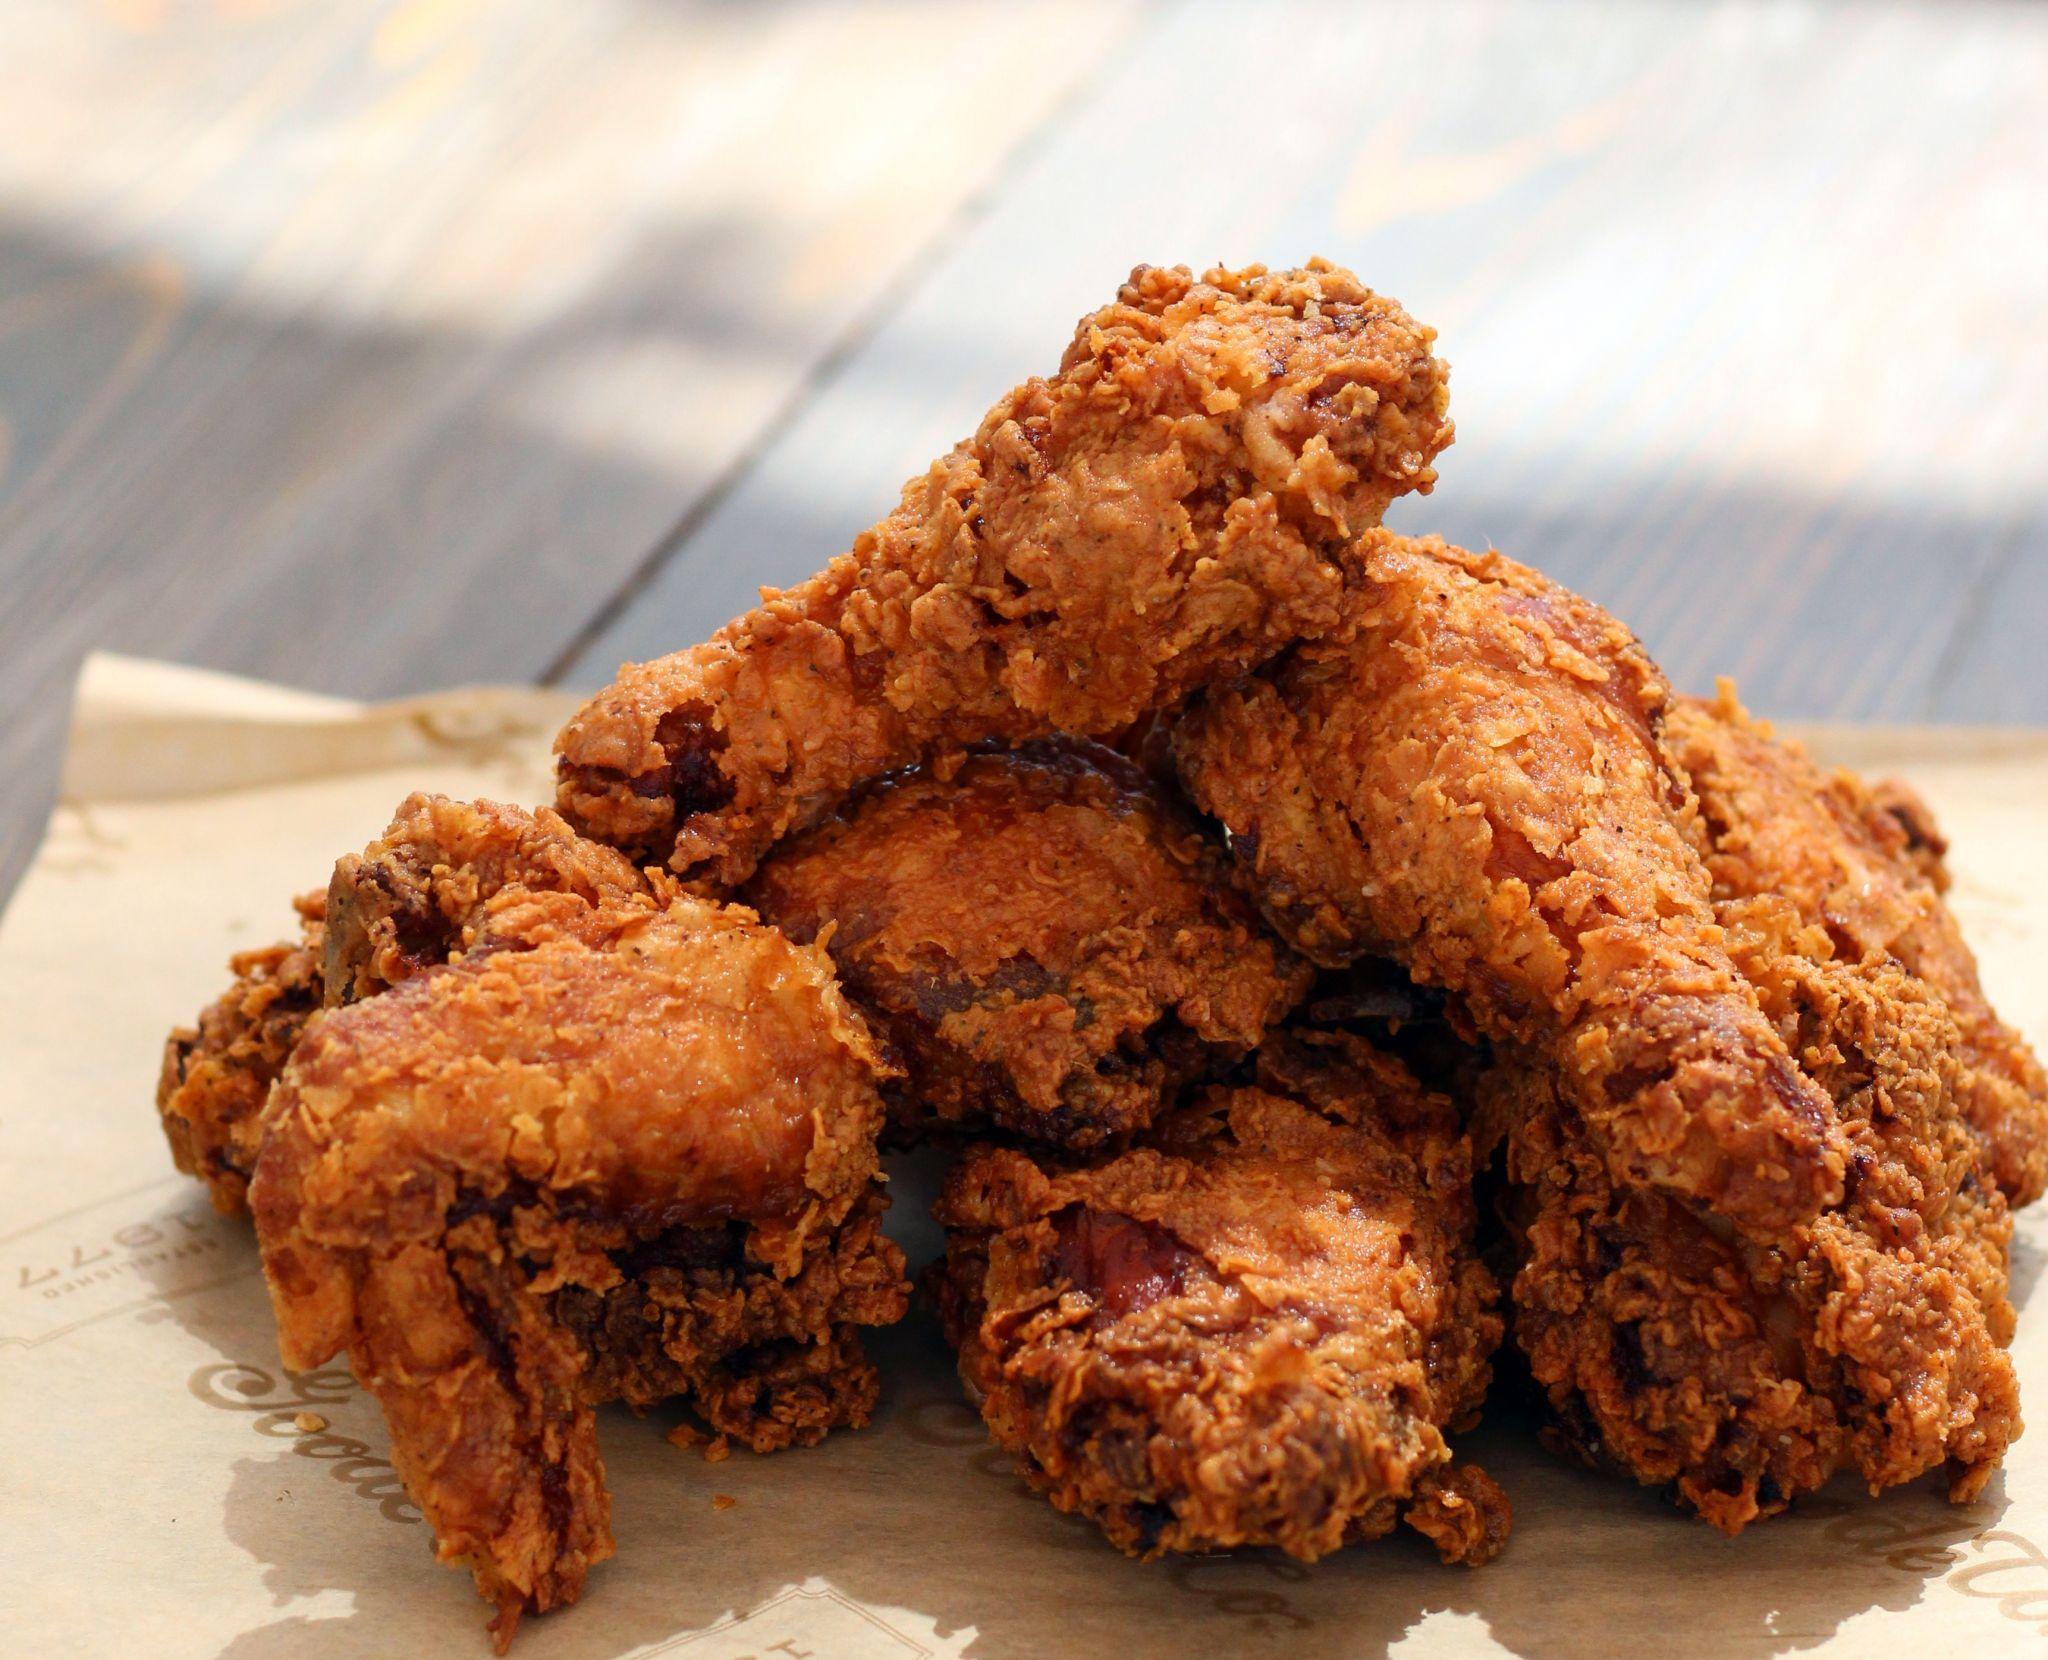 5 Houston restaurants now serving up fried chicken